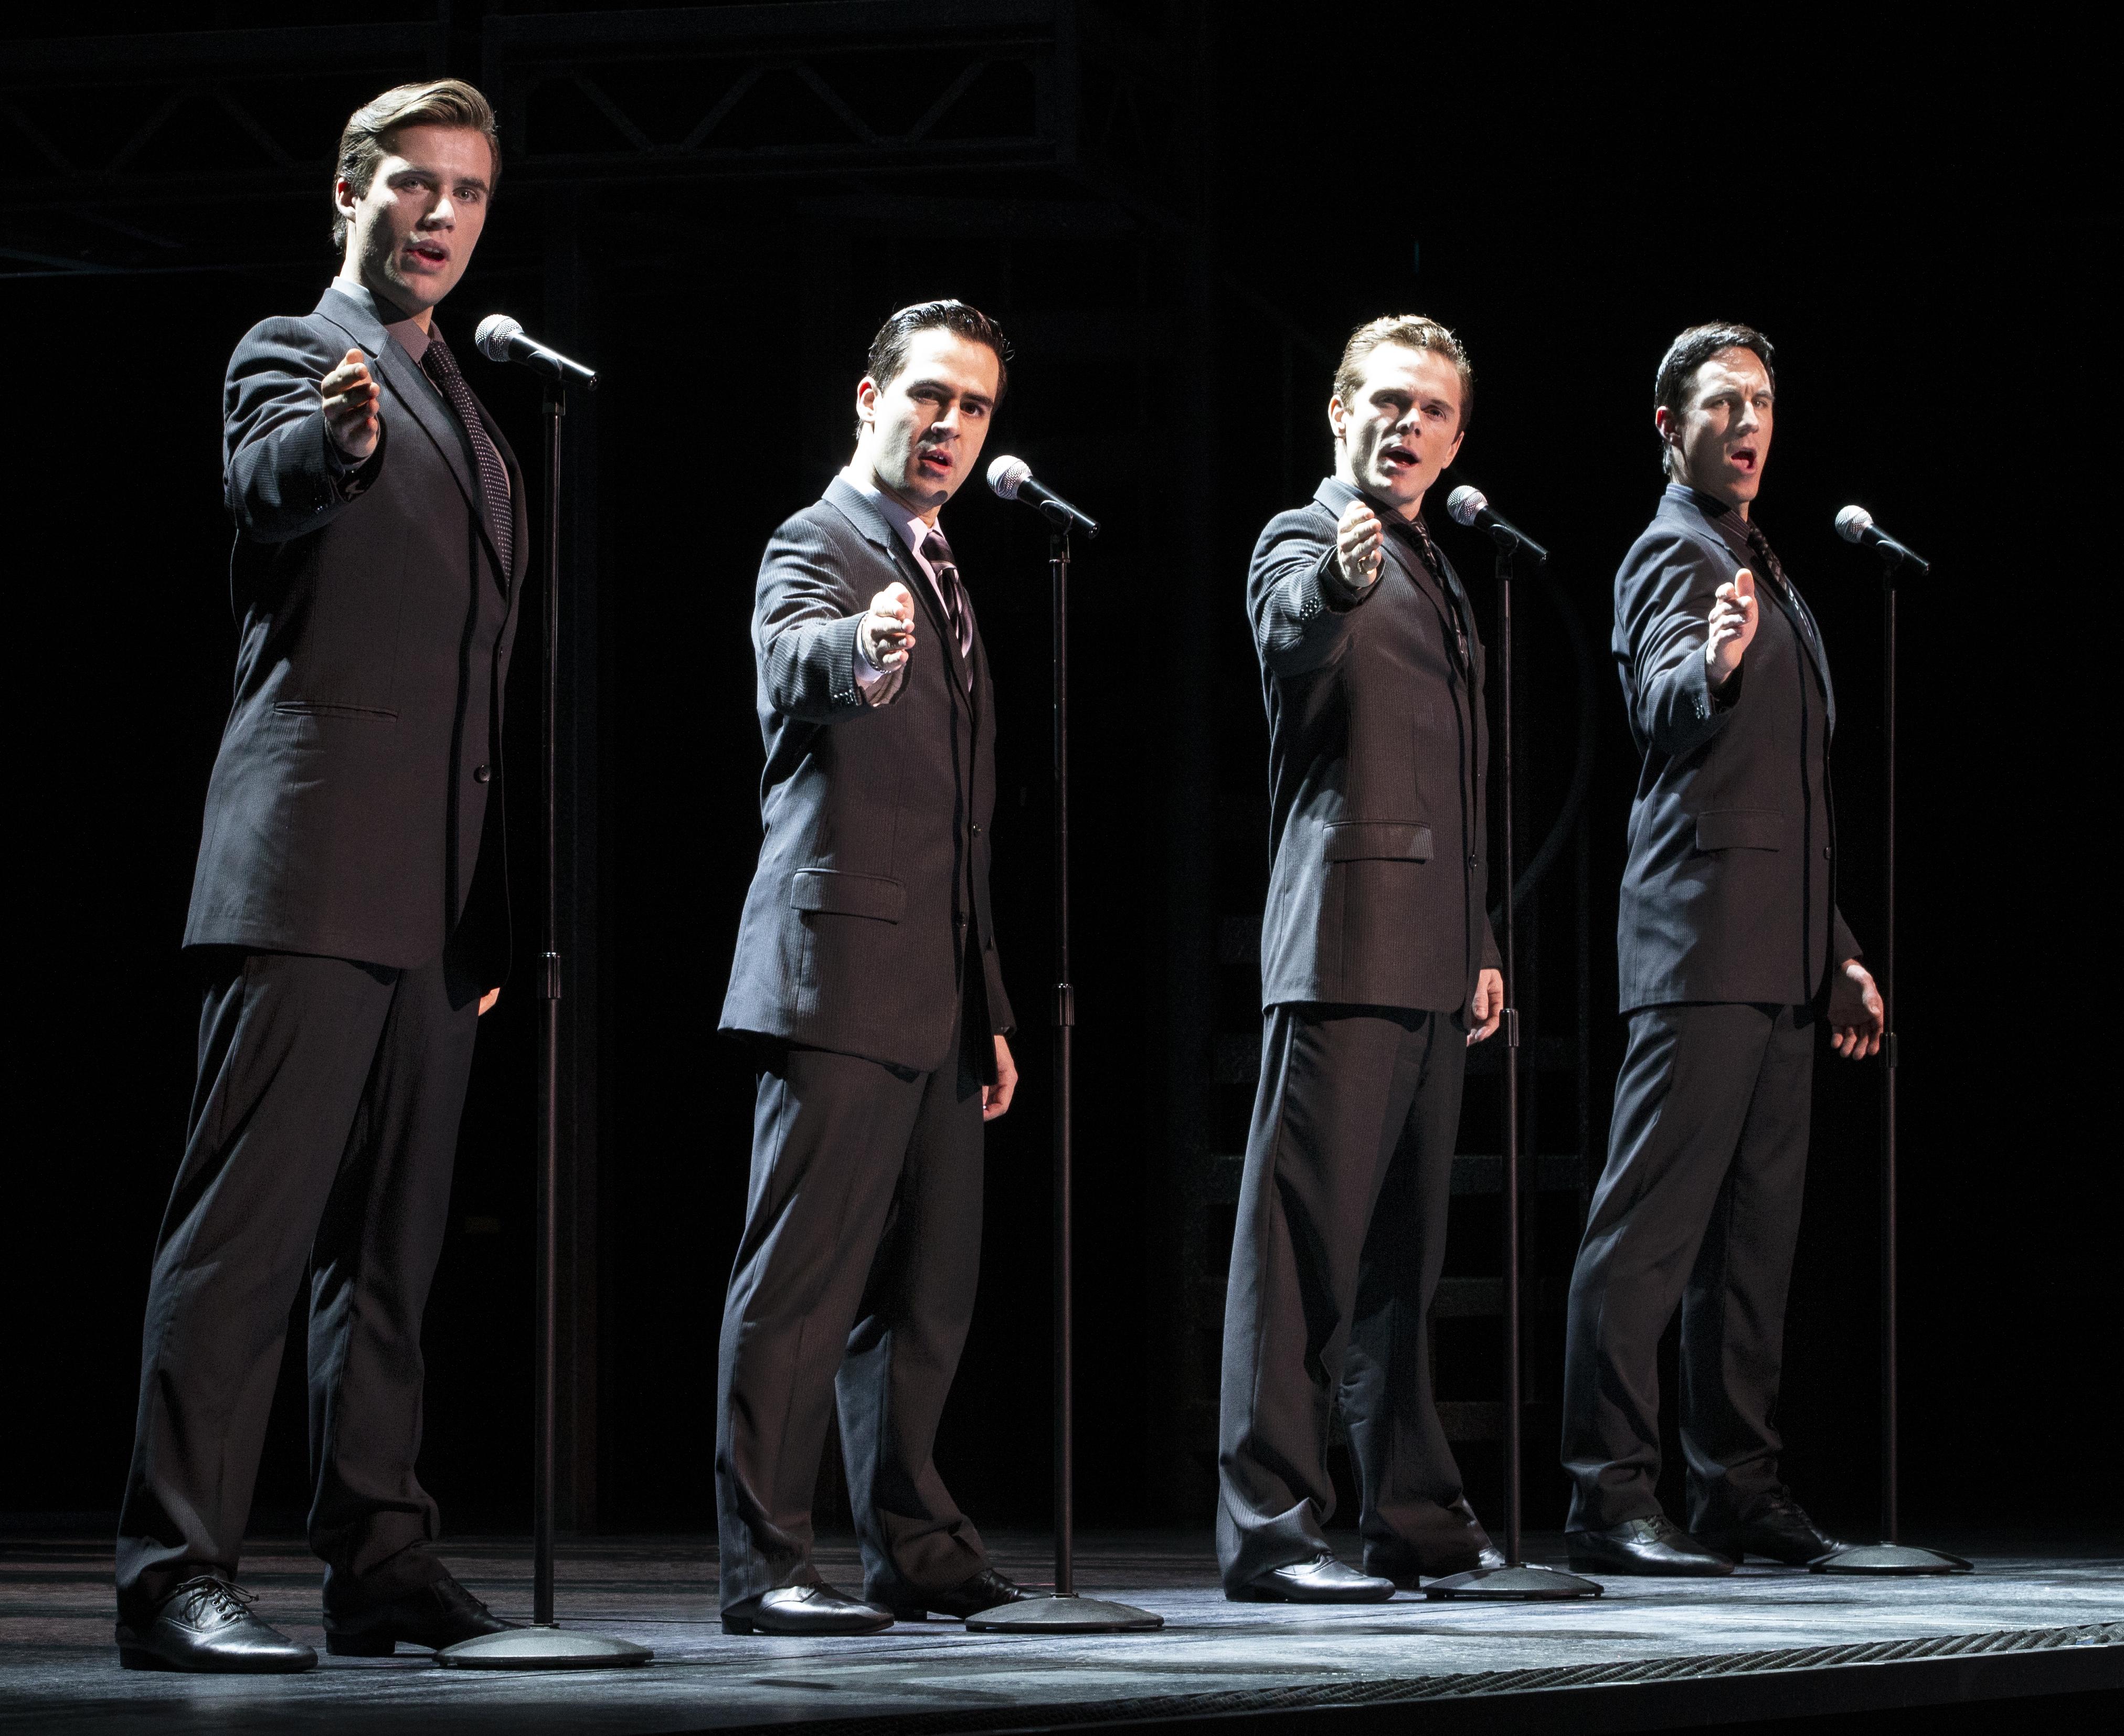 Jersey Bys- Thomas McGuane, Ryan Gonzalez, Cameron MacDonald & Glaston Toft.